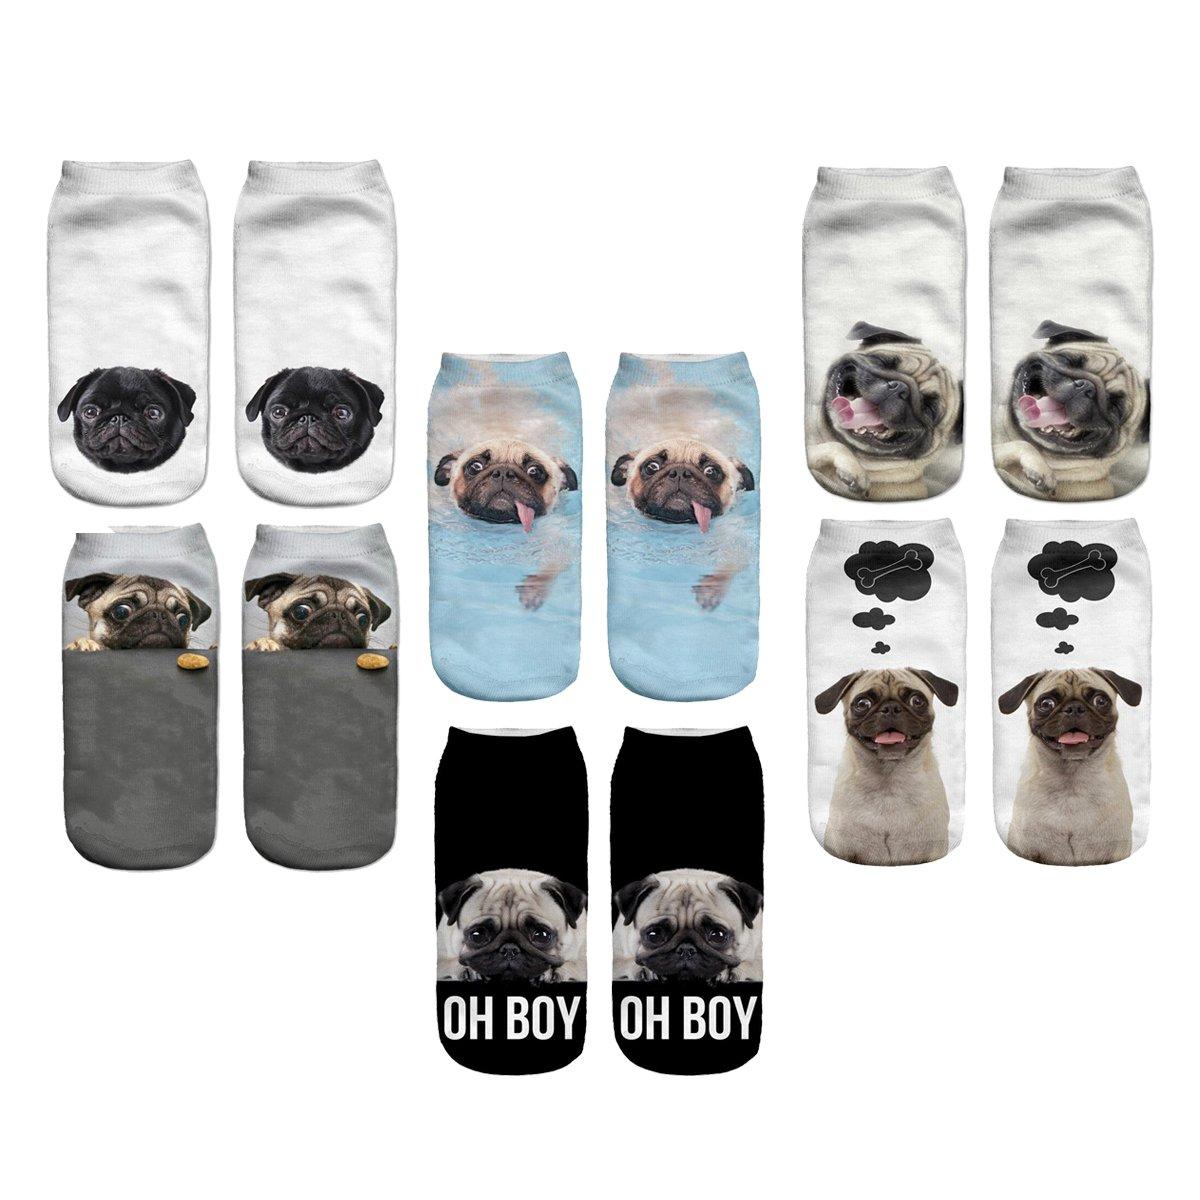 3D Cartoon Funny Low Cut Ankle Socks Amazing Novelty Print Boat Socks (Pug)